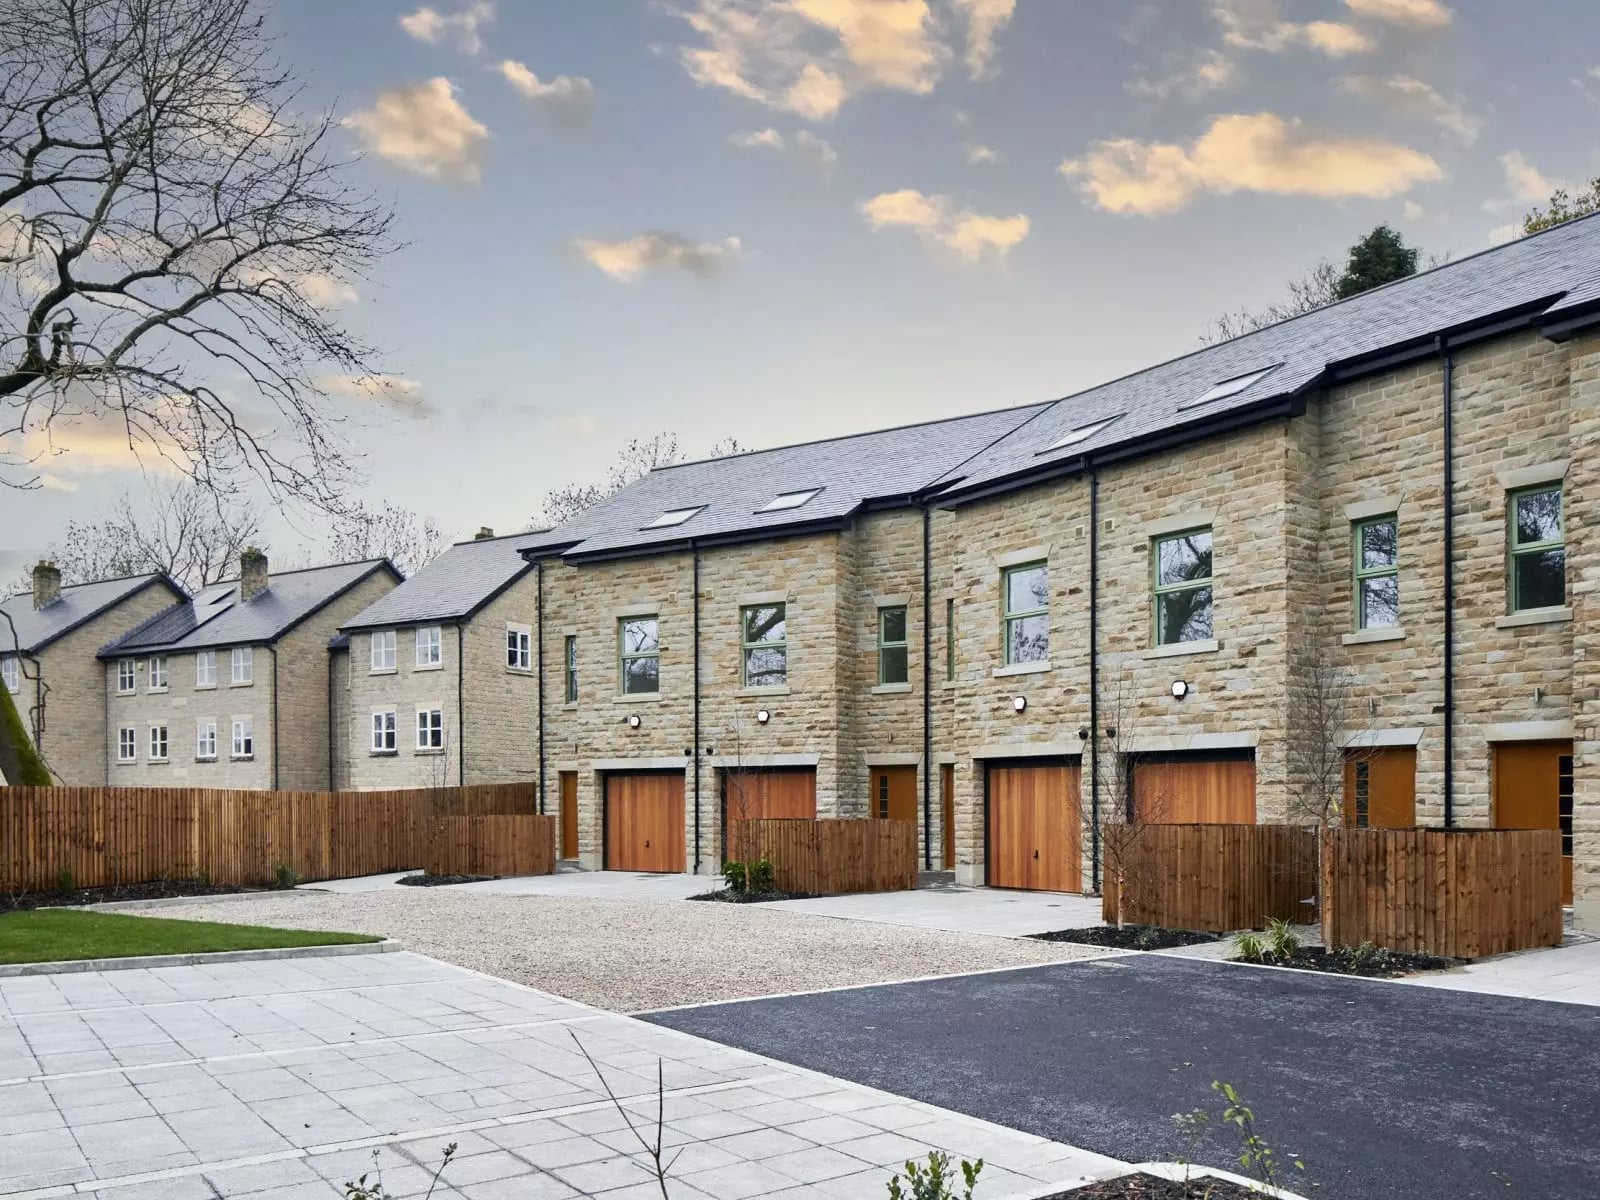 ingersley-crescent-bollington-street-view